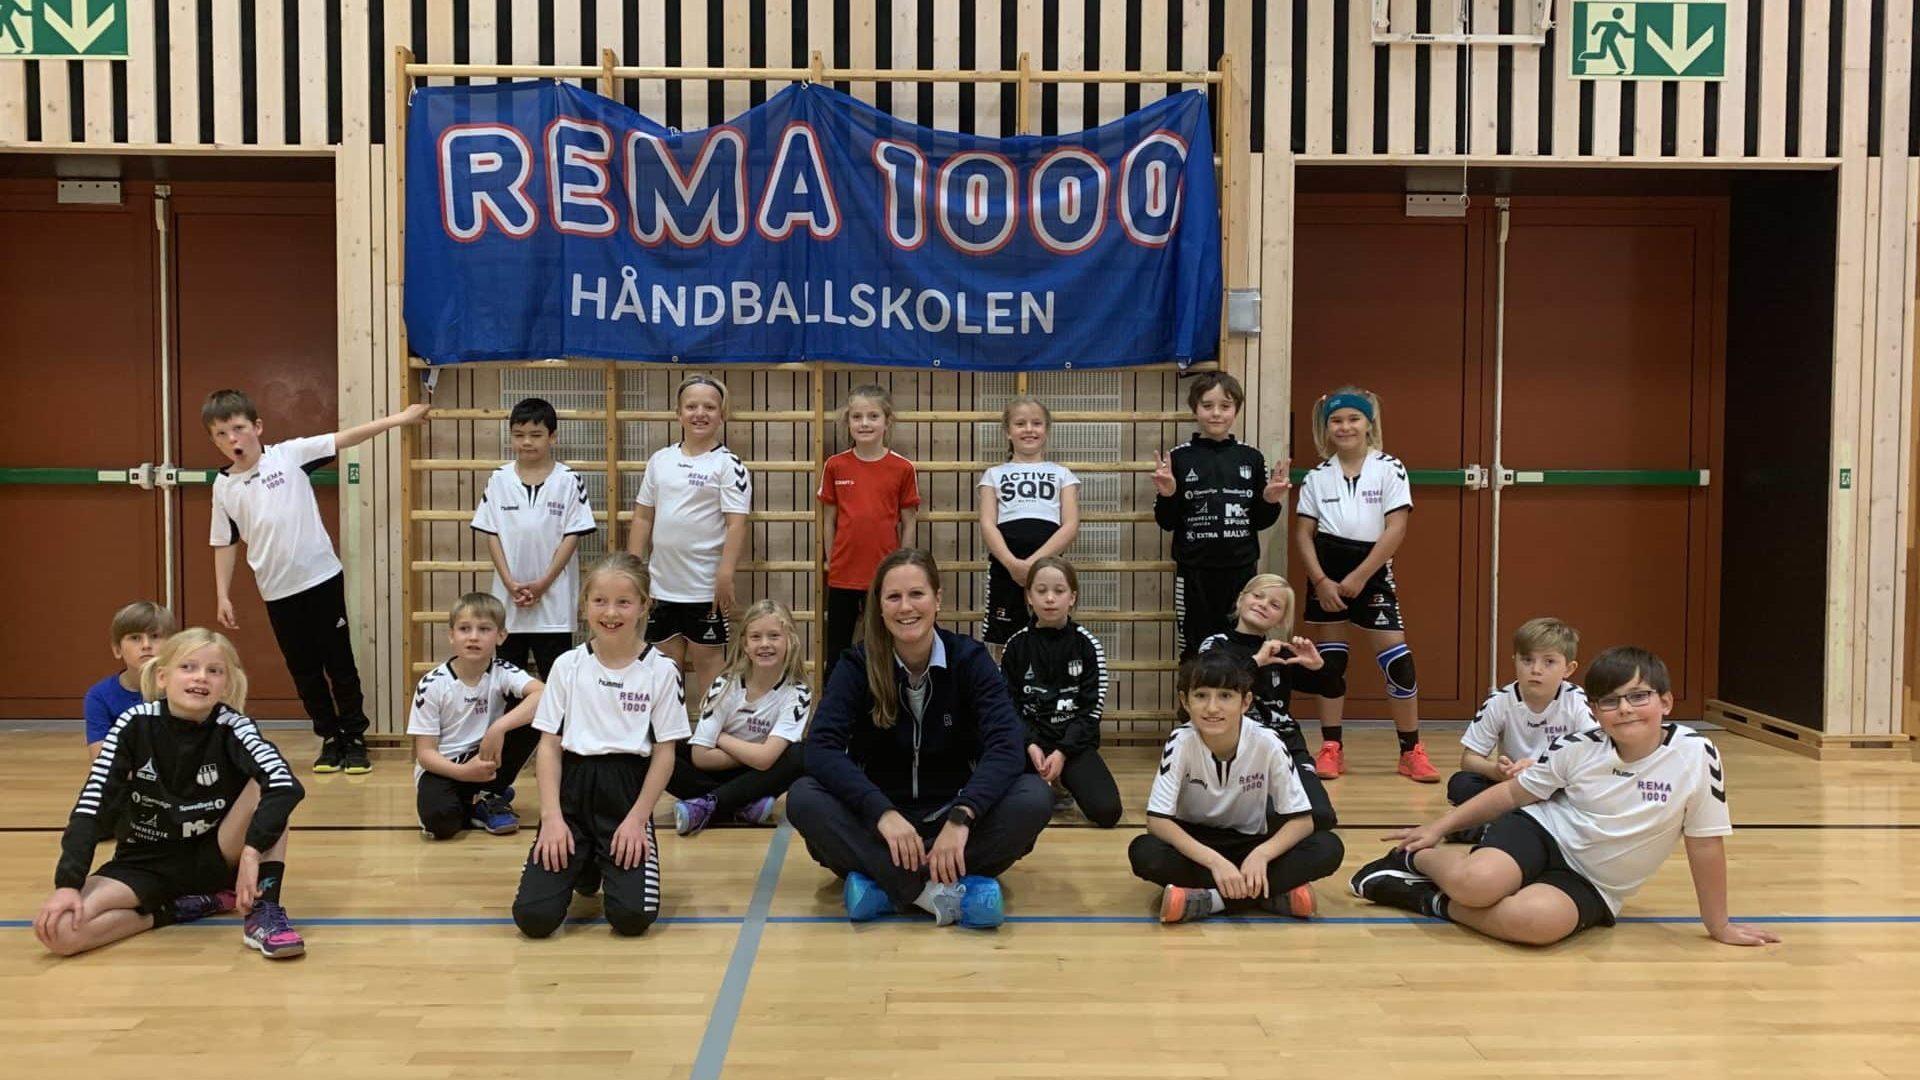 Rema håndballskole i høstferien 2020